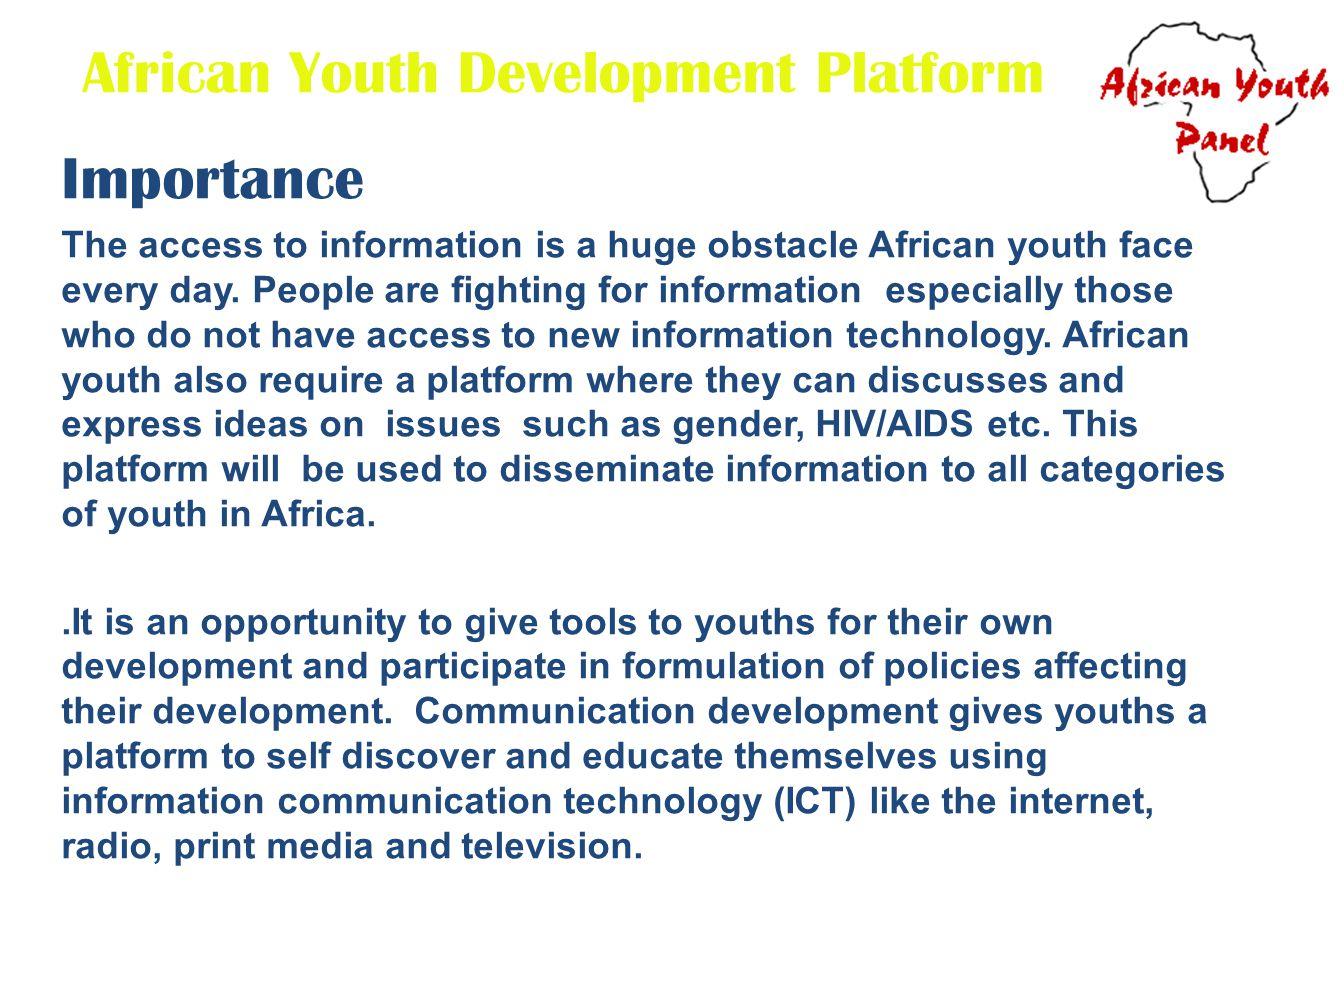 African Youth Development Platform